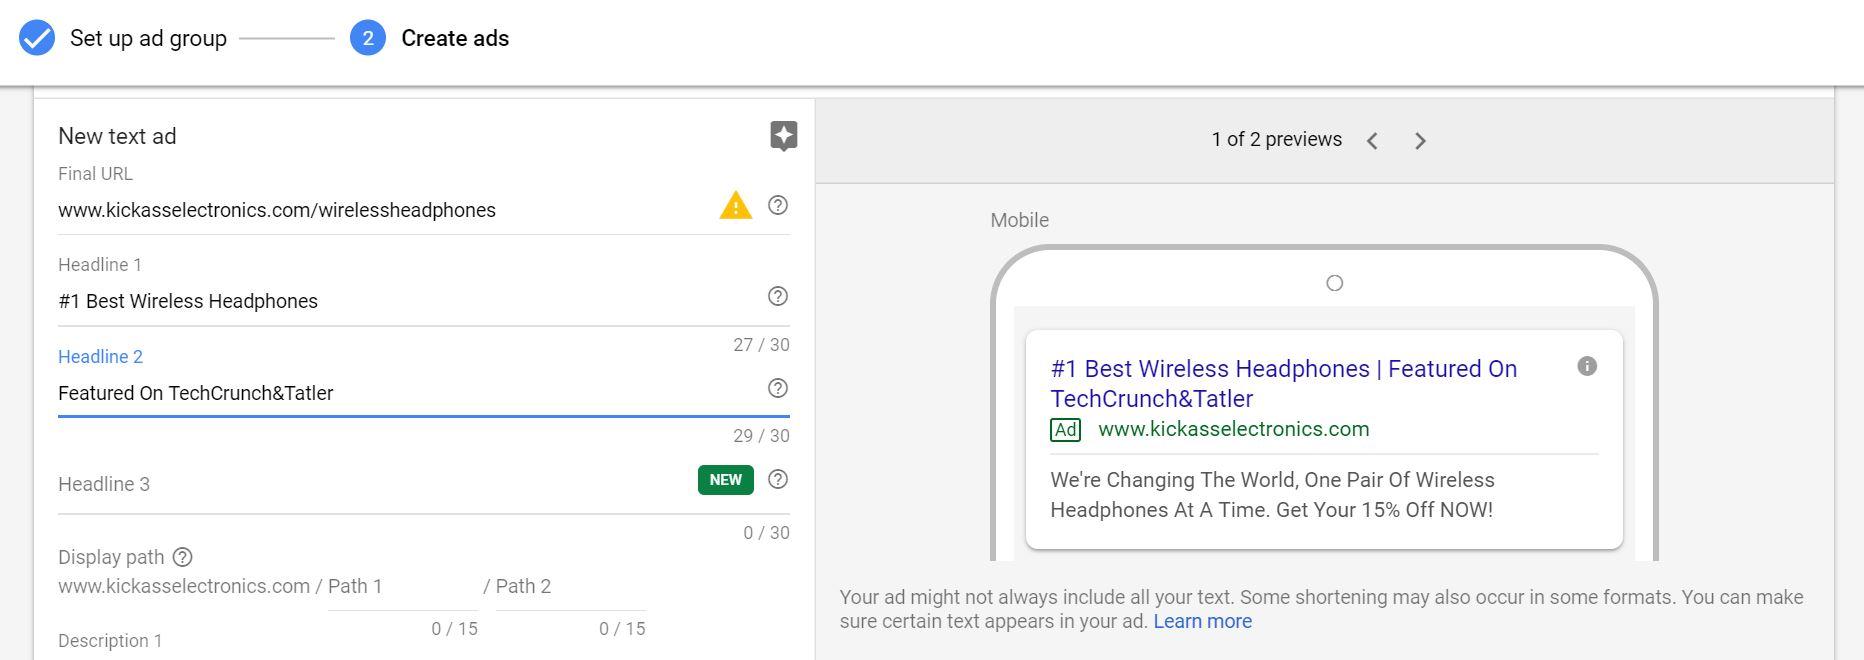 writing ad group copy google ads.JPG